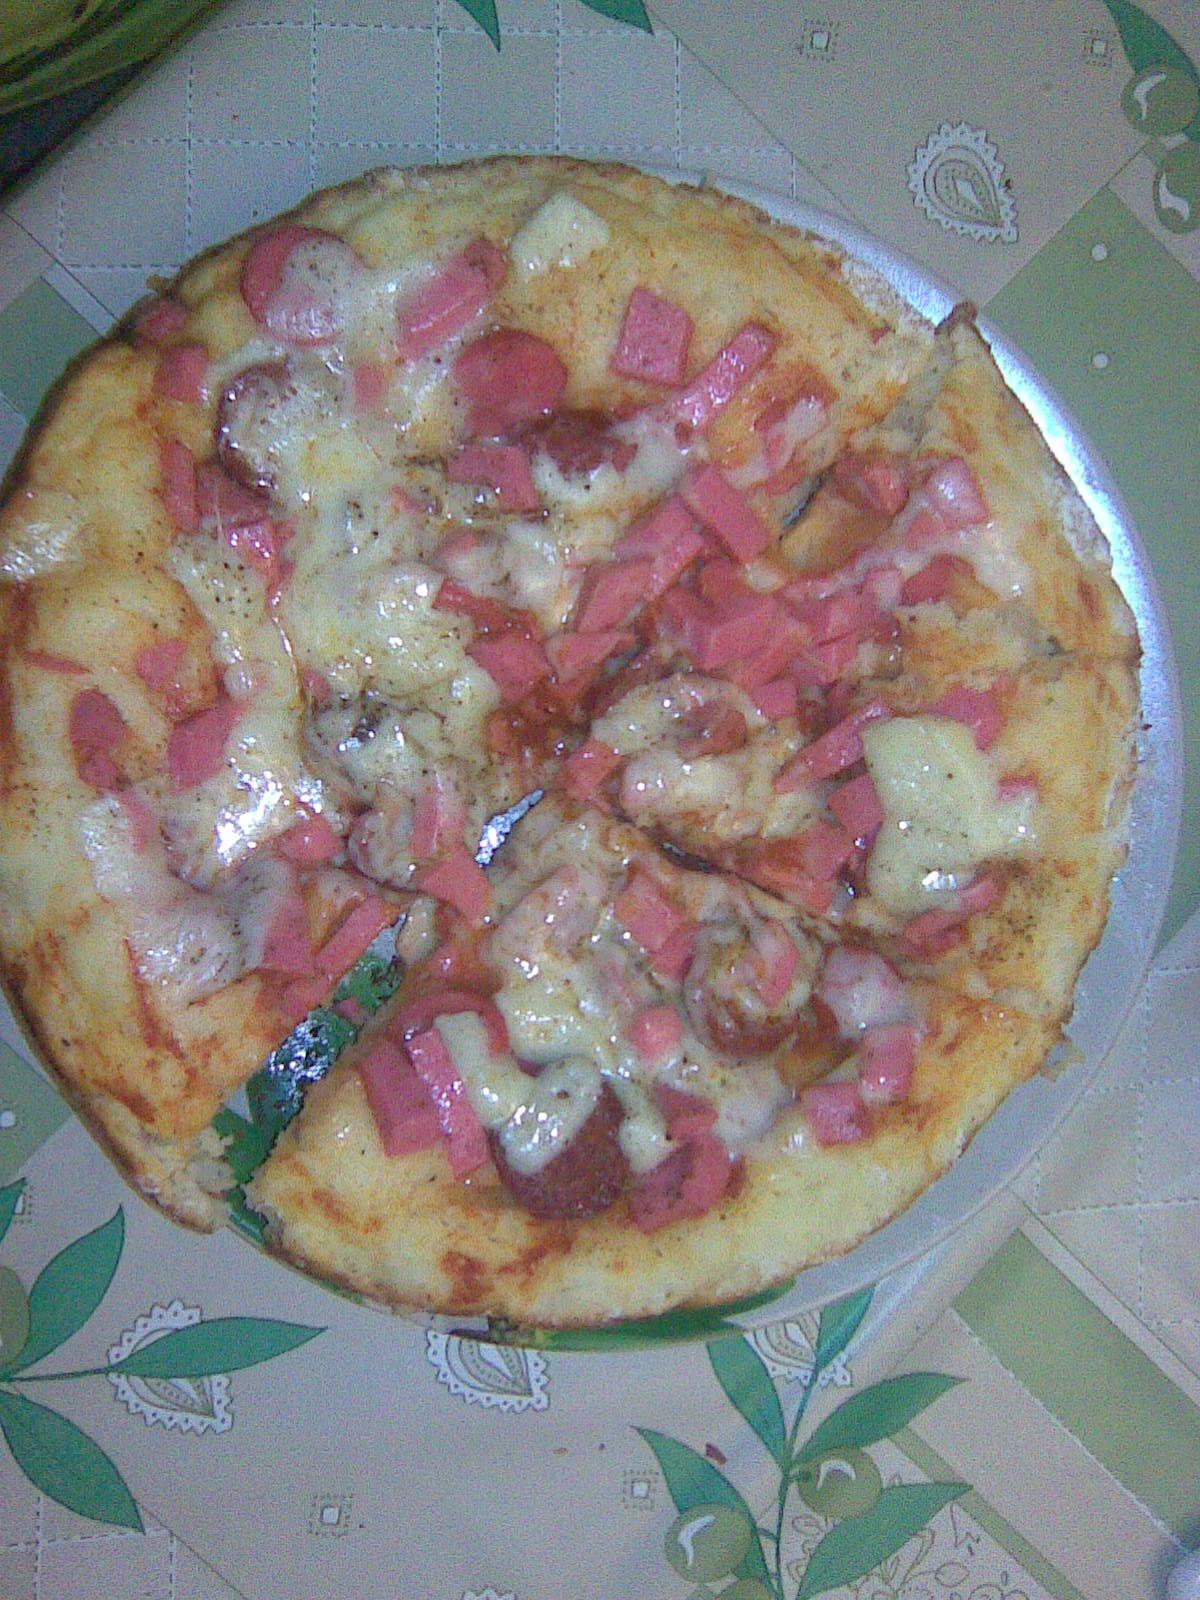 goruntu0545-jpg.82119,Tavada Pişen Kolay Pizza Tarifi